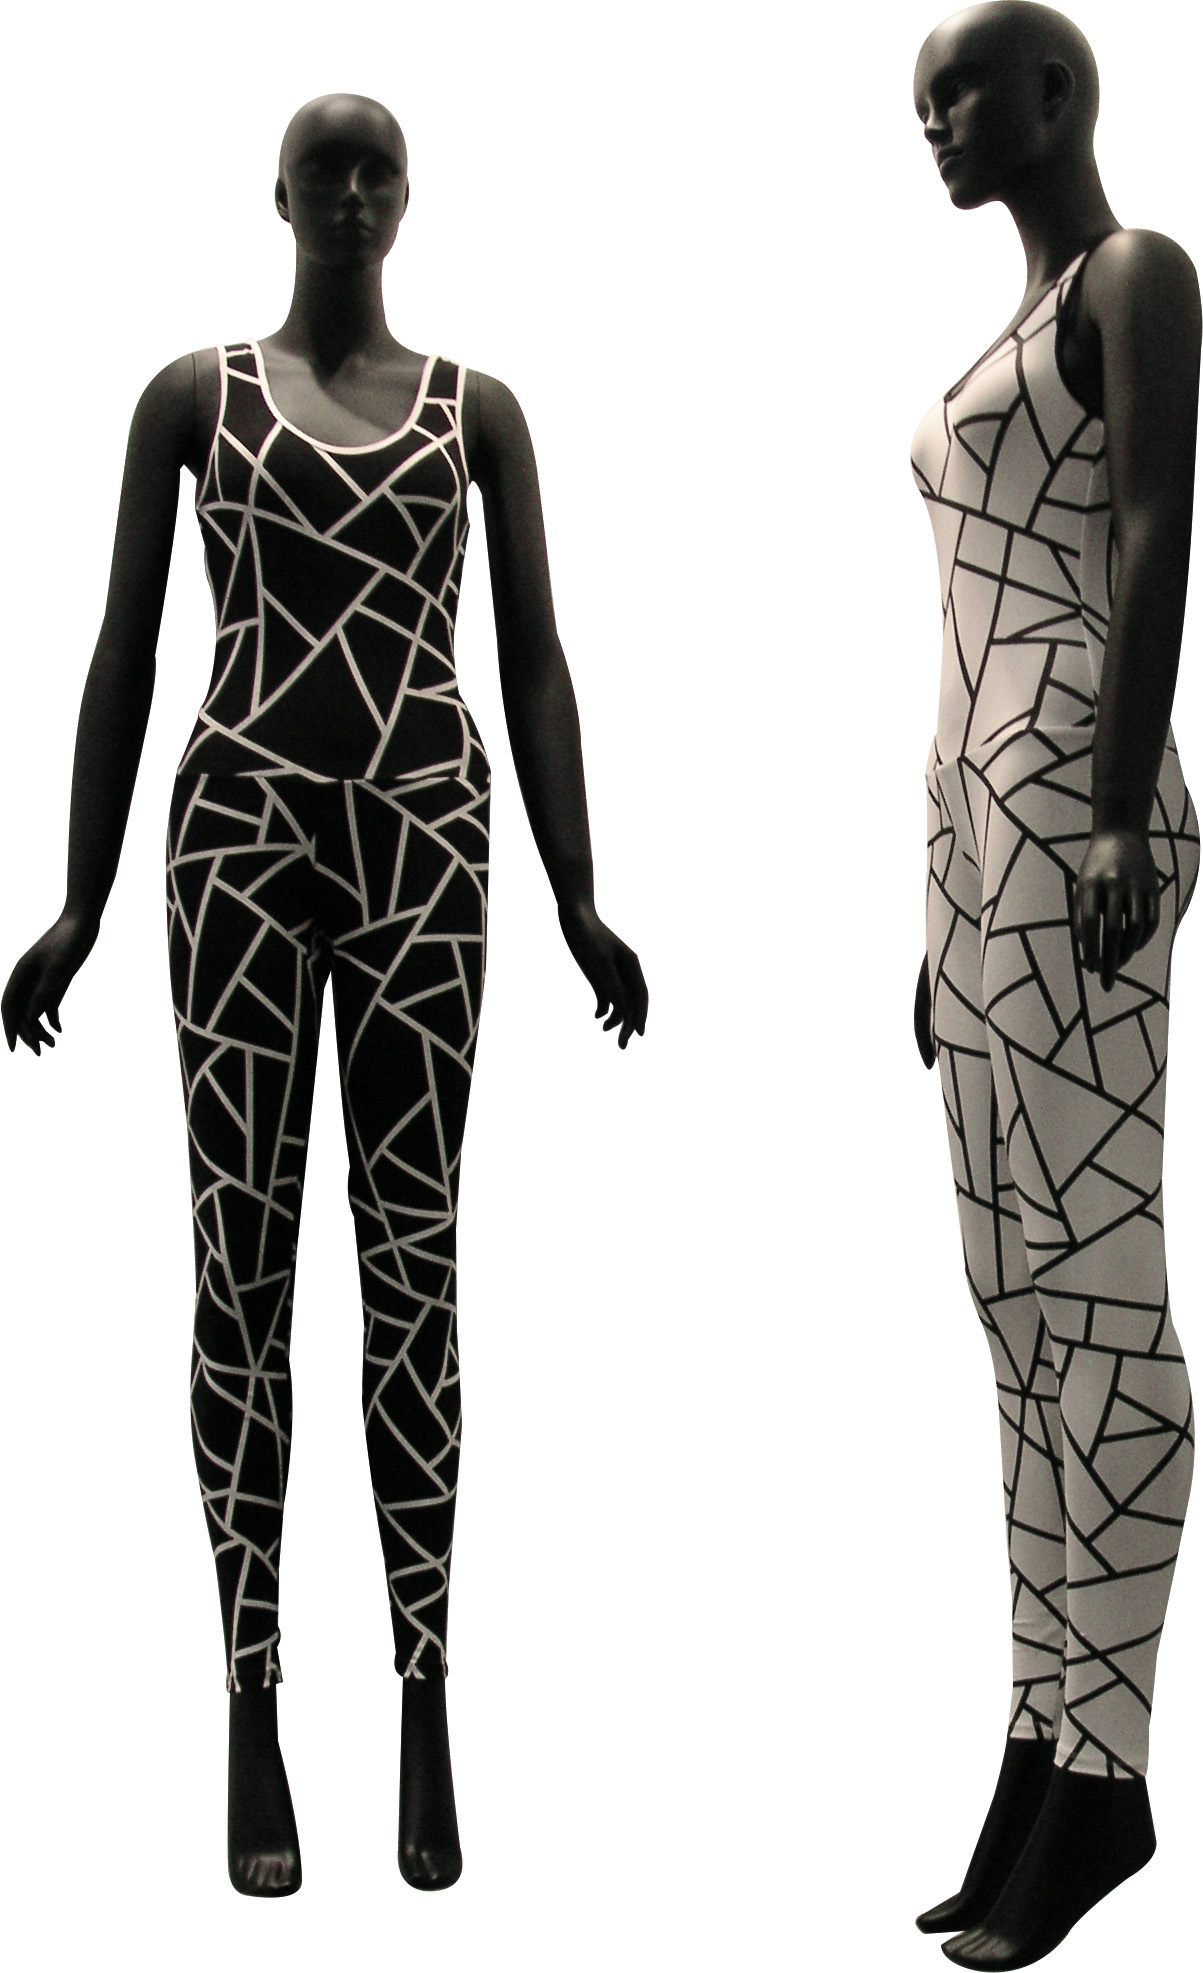 LI-NING, Sportswear for Li Ning Hong Kong Fashion Week